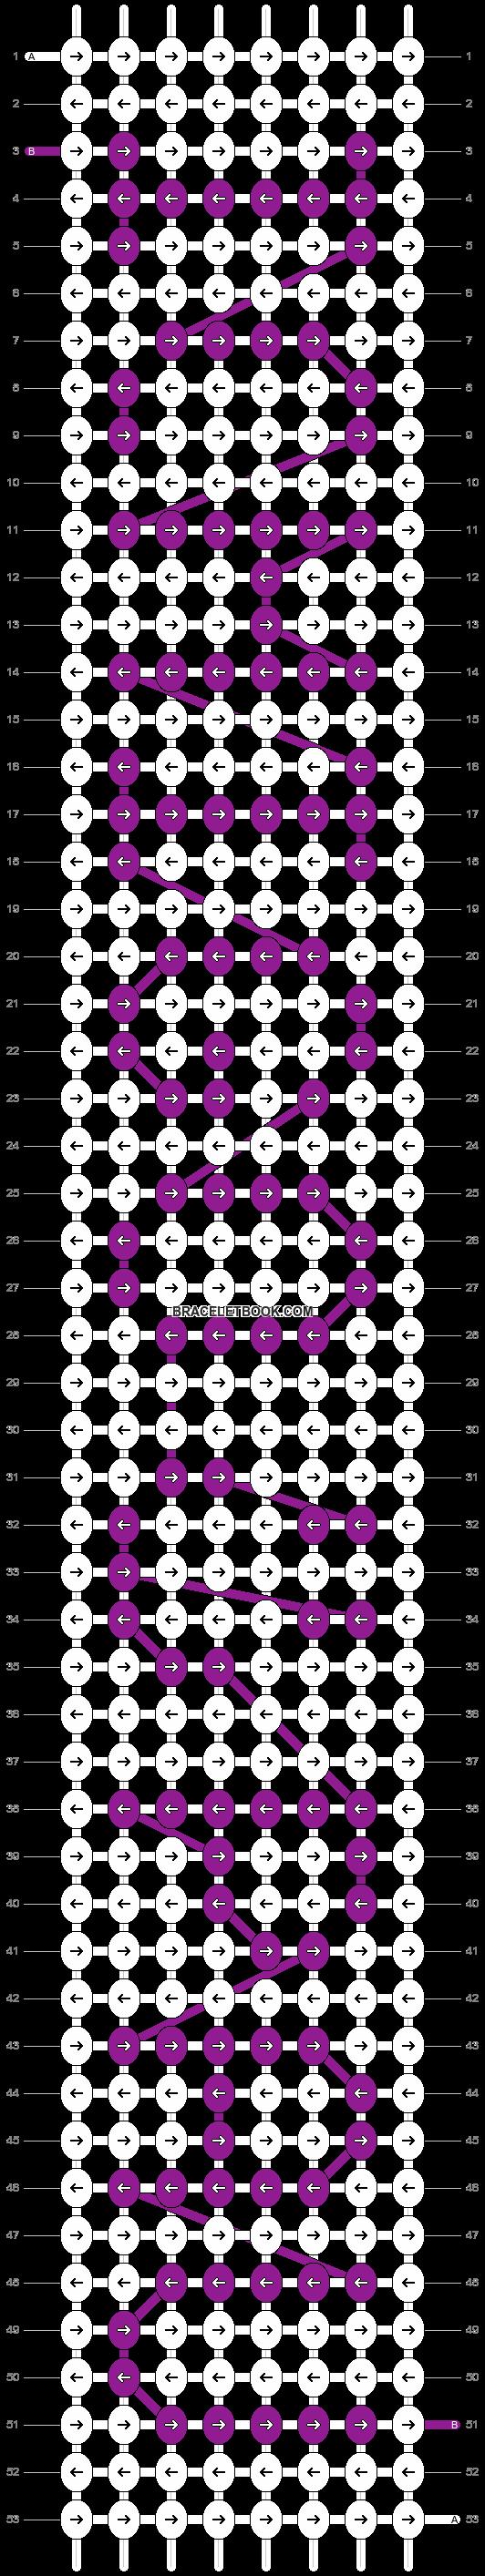 Alpha pattern #1274 pattern